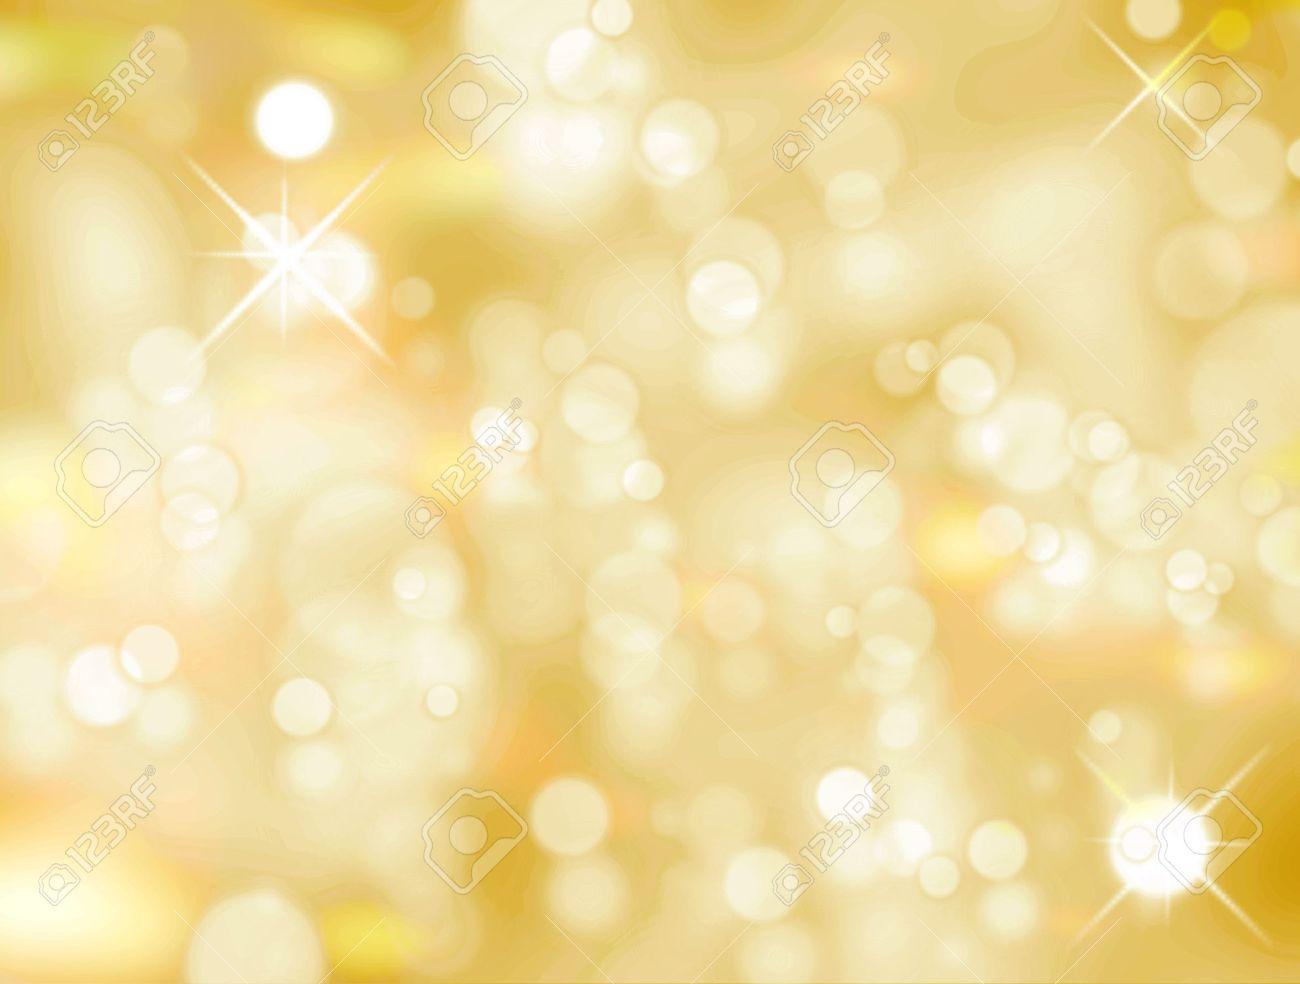 Christmas light background, Yellow and white luminous image Stock Photo - 9694108